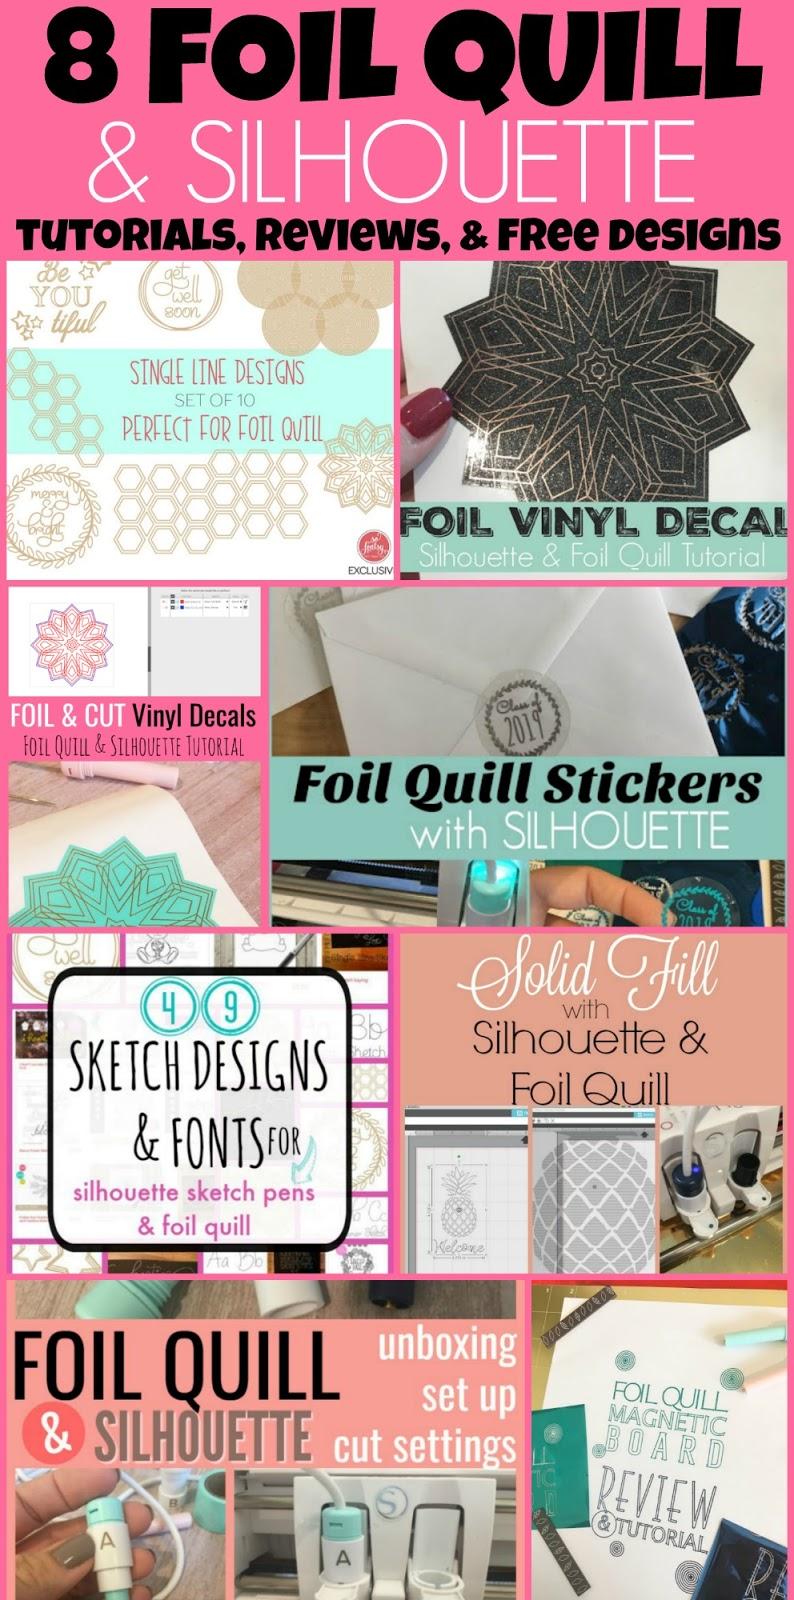 foil quill designs, foil quil, foil quill silhouette, foil quill tutorials, SVG designs